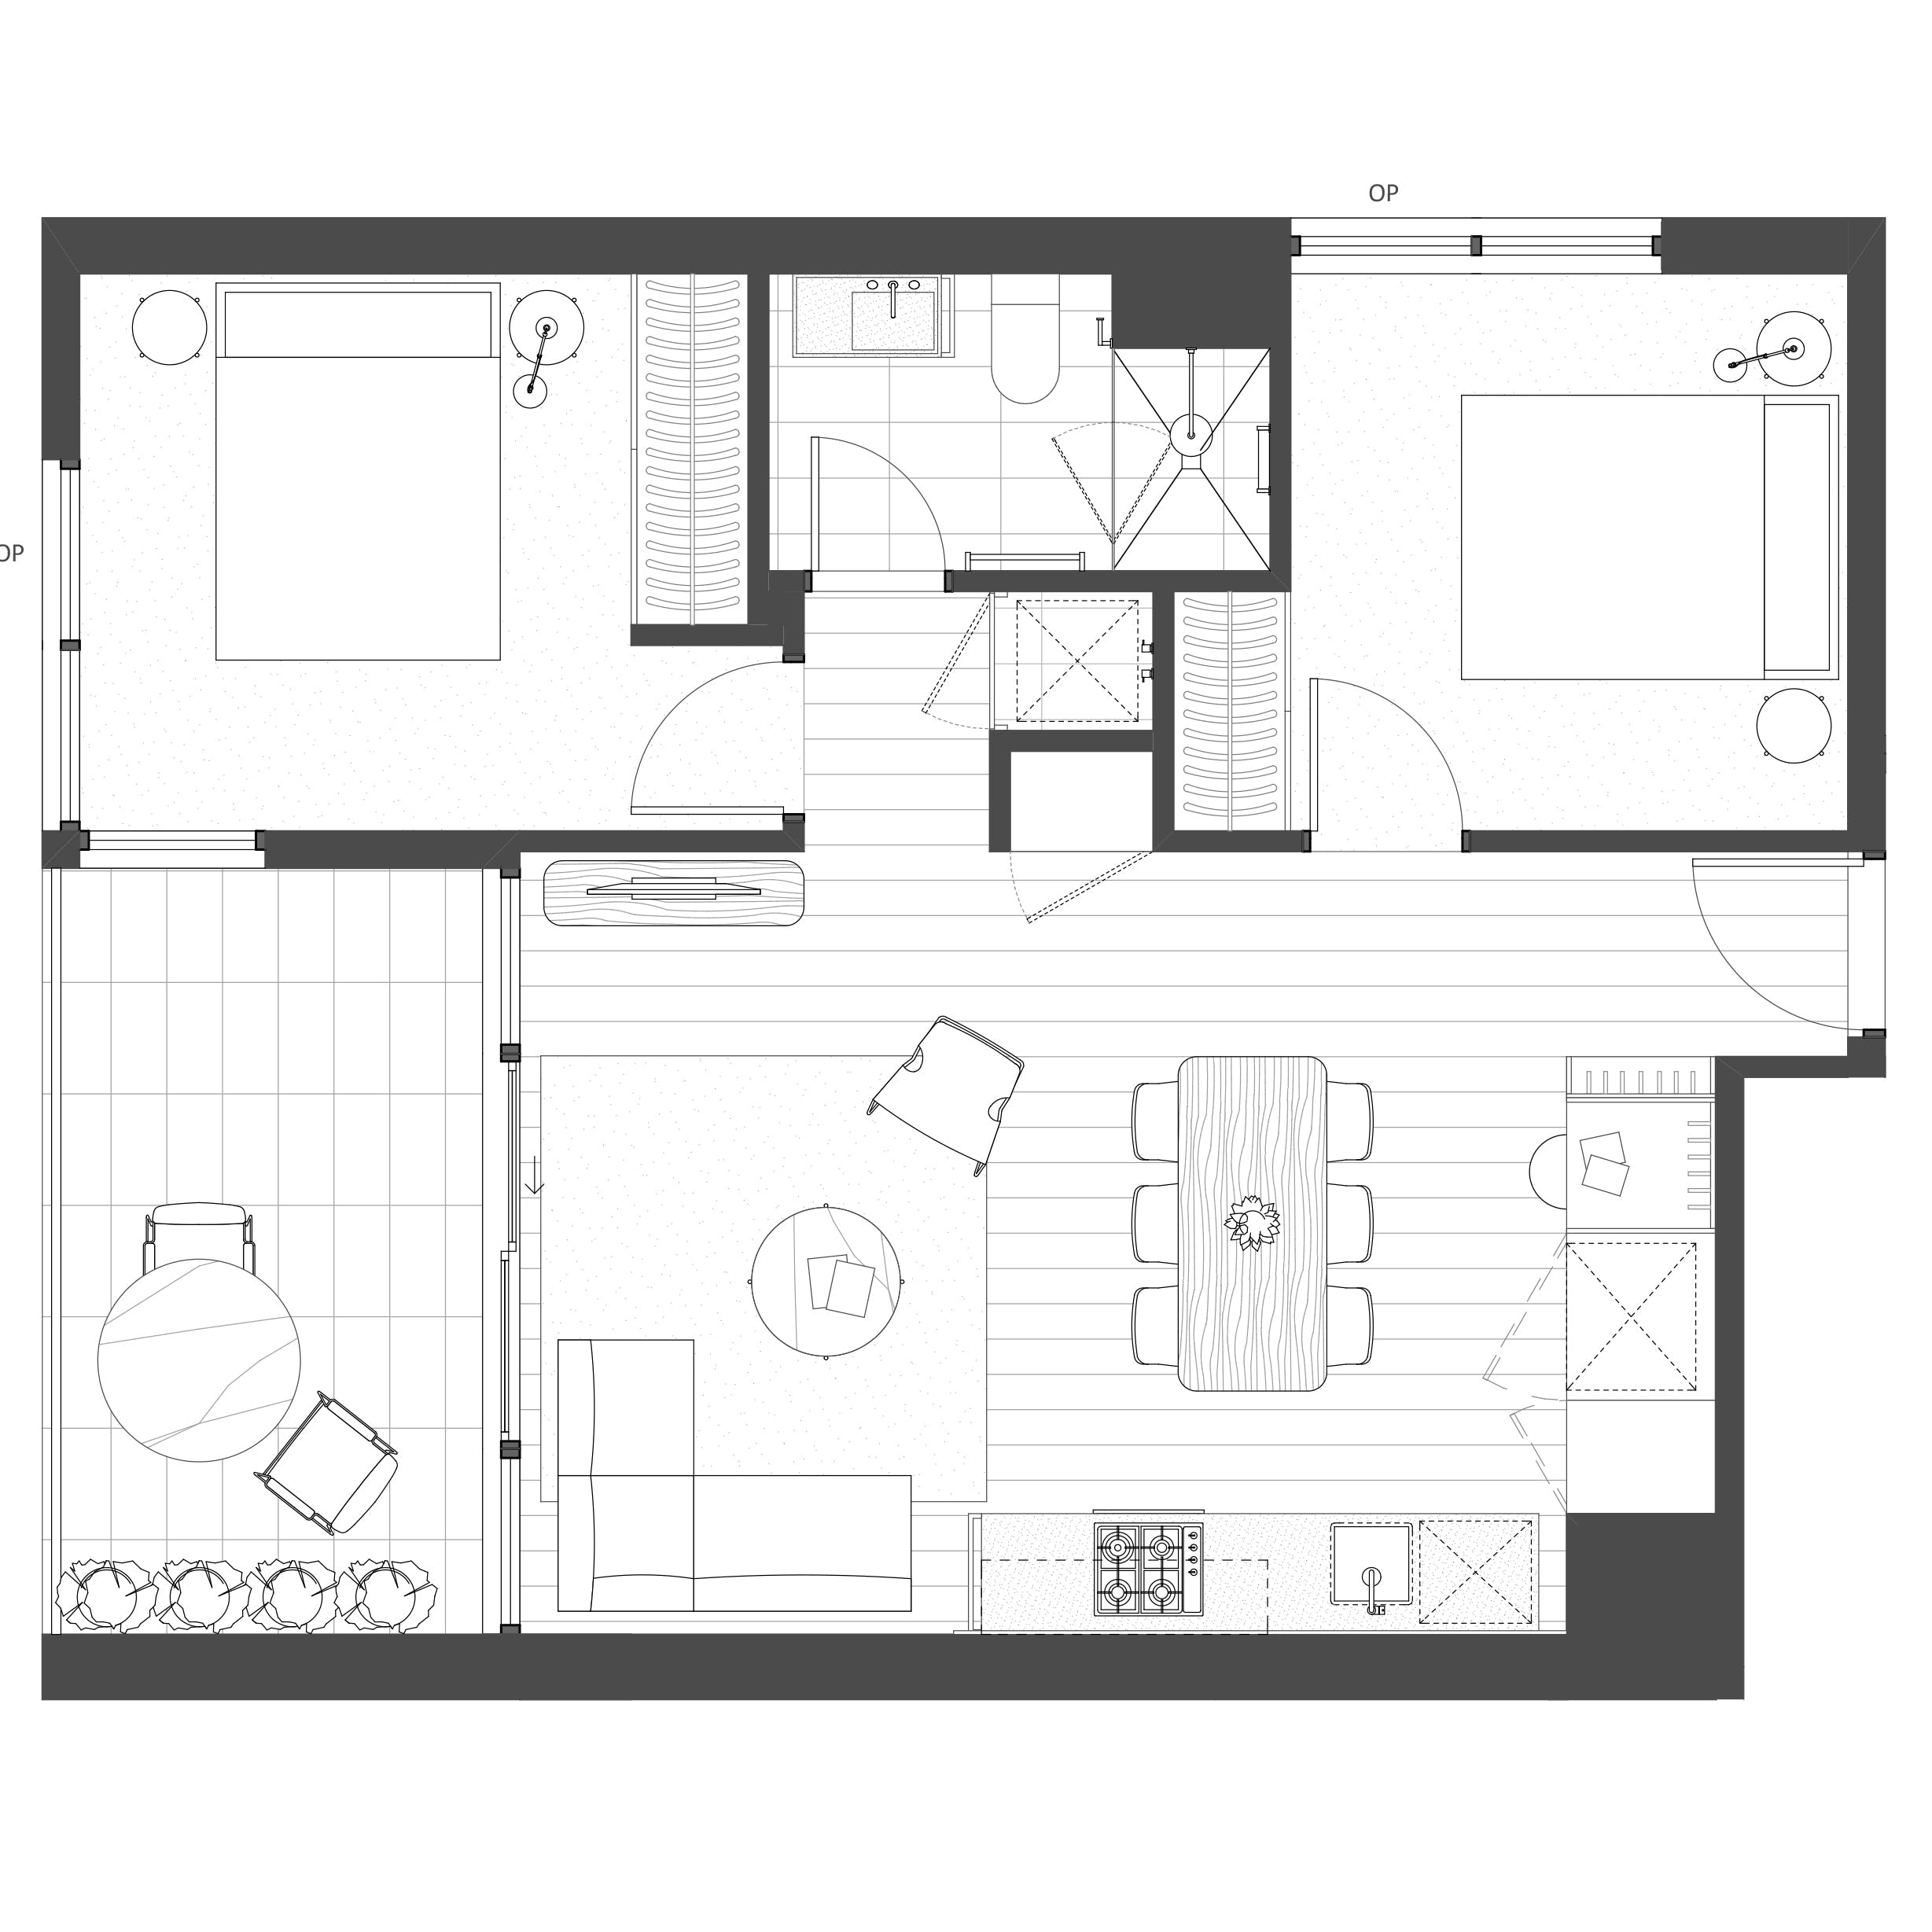 2 Bedroom, 1 Bathroom, 1 Carpark